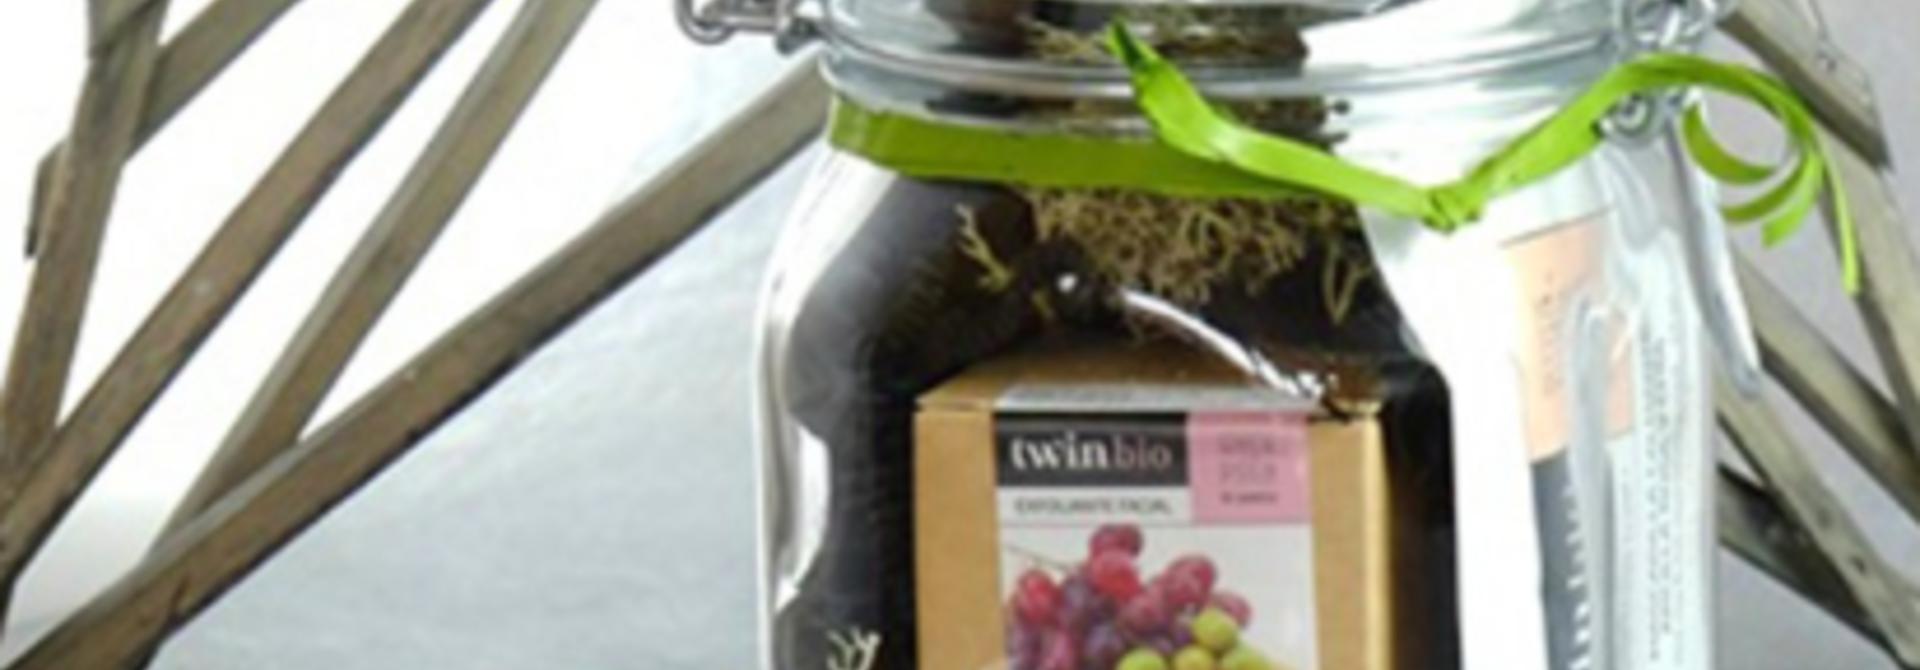 TwinBio Pack gevoelige huid